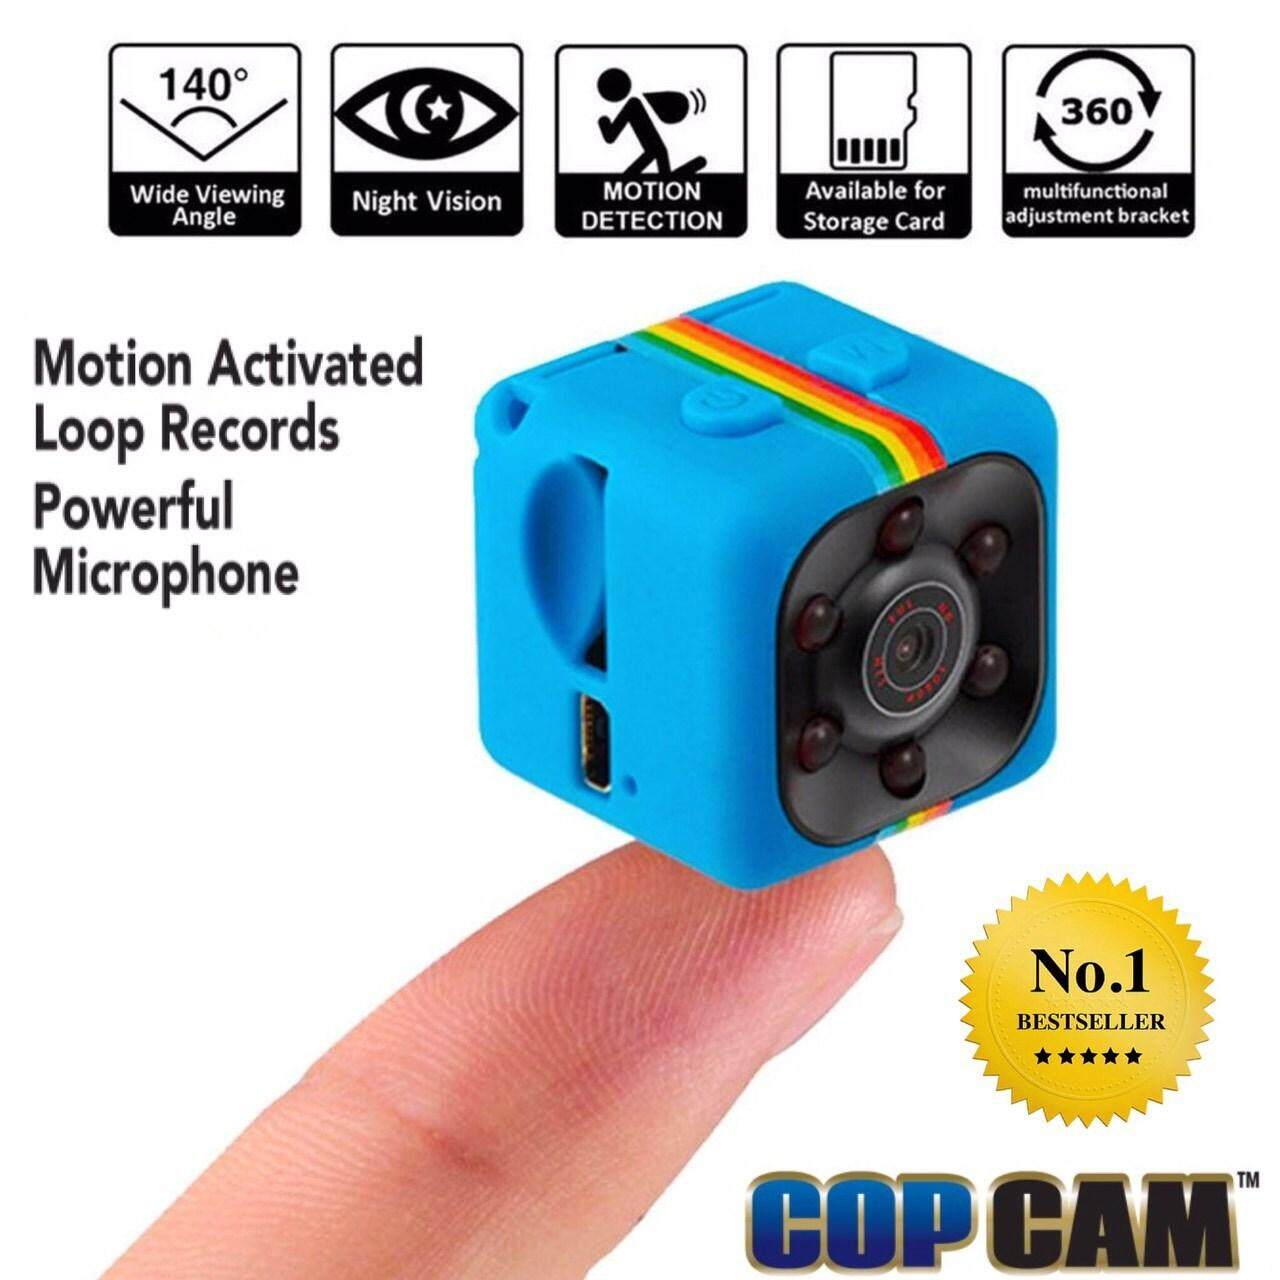 Cop Cam กล้องจิ๋วมหัศจรรย์ Full Hd กล้องถ่ายรูป กล้องติดรถ กล้องจิ๋วขนาดเล็กมินิ บันทึกวีดีโอและภาพนิ่ง ความละเอียดสูงแบบ Full Hd มาพร้อมแมมเมอลี่การ์ด ด้นใน ใช้งานง่าย สะดวกพกพากล้องความละเอียดสูง.